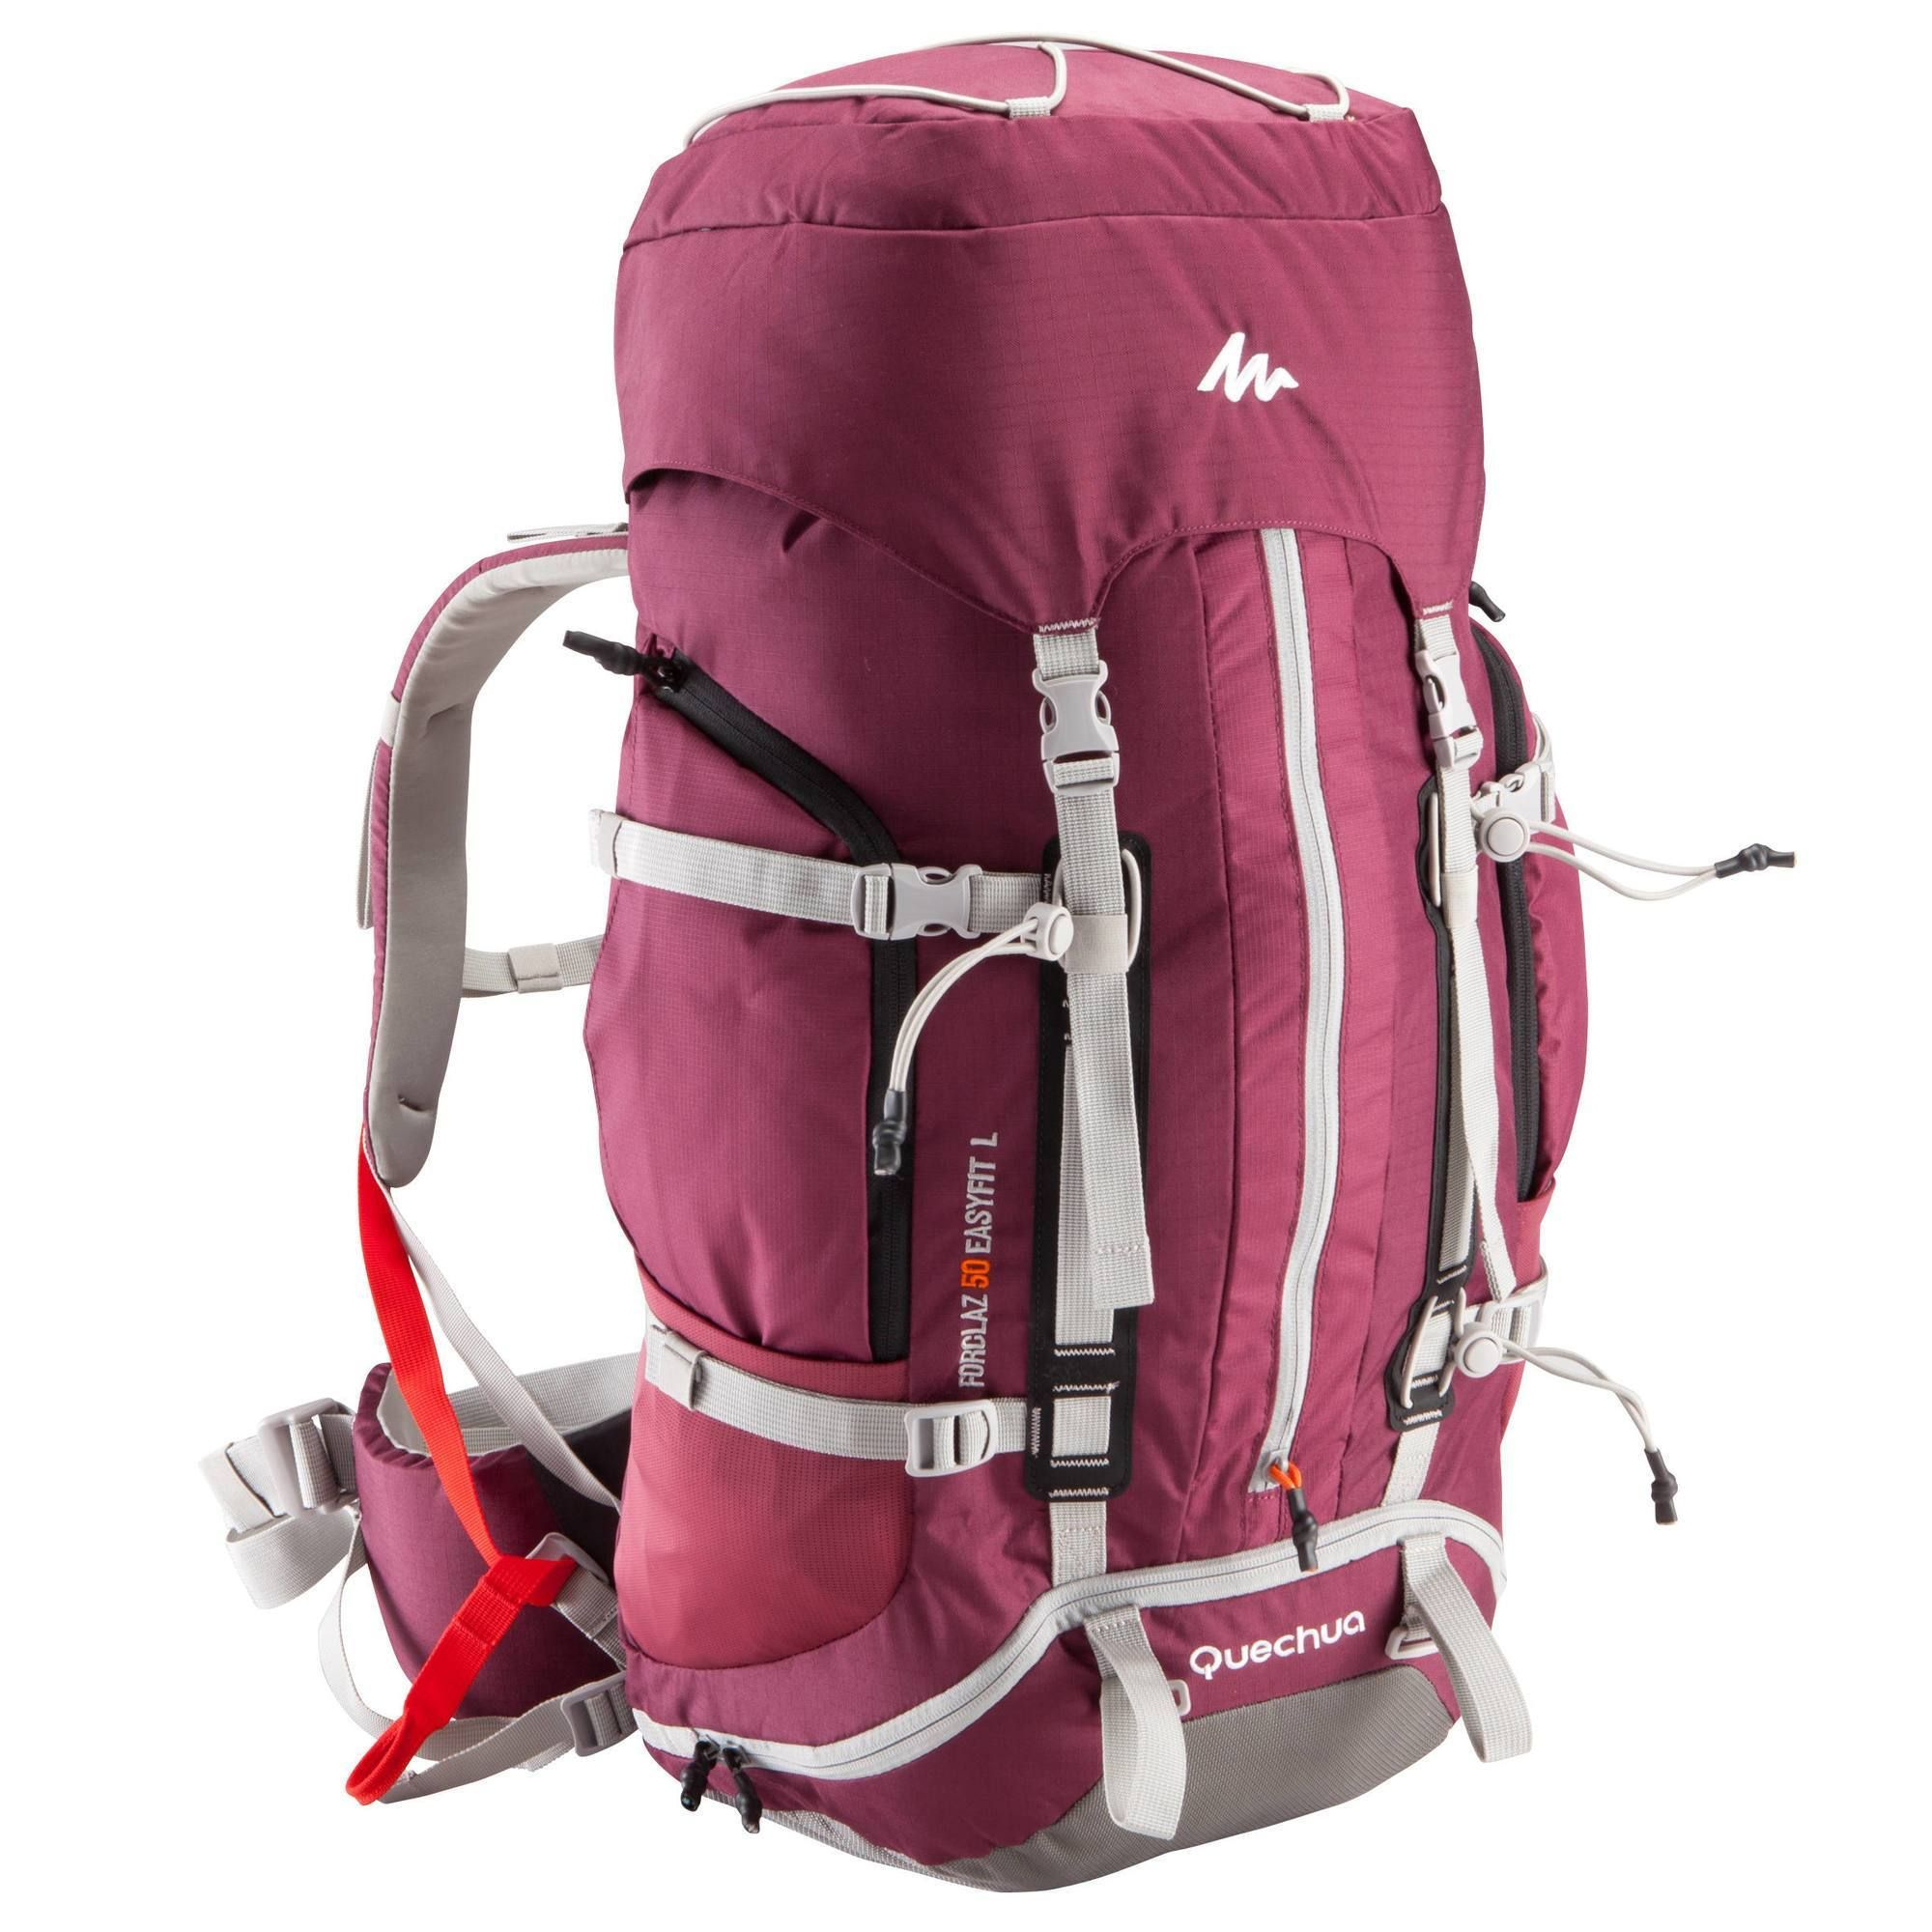 Quechua Forclaz Easyfit 50L Women's Trekking Backpack. Recommended ...